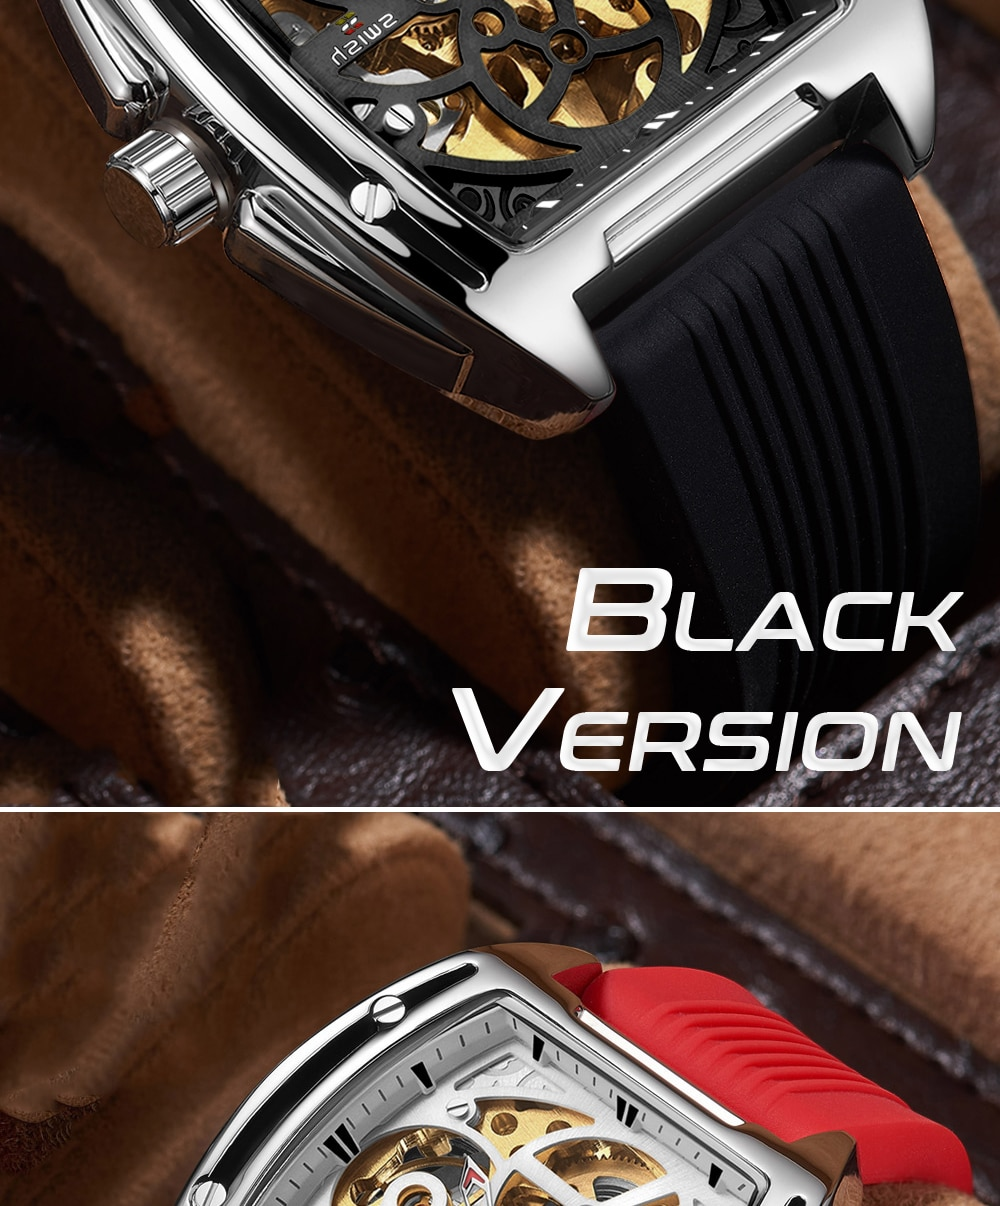 H0cc7690d3e7b4077acf13d53590d6dc8j SWISH Brand Design Luxury Men's Mechanical Wristwatch